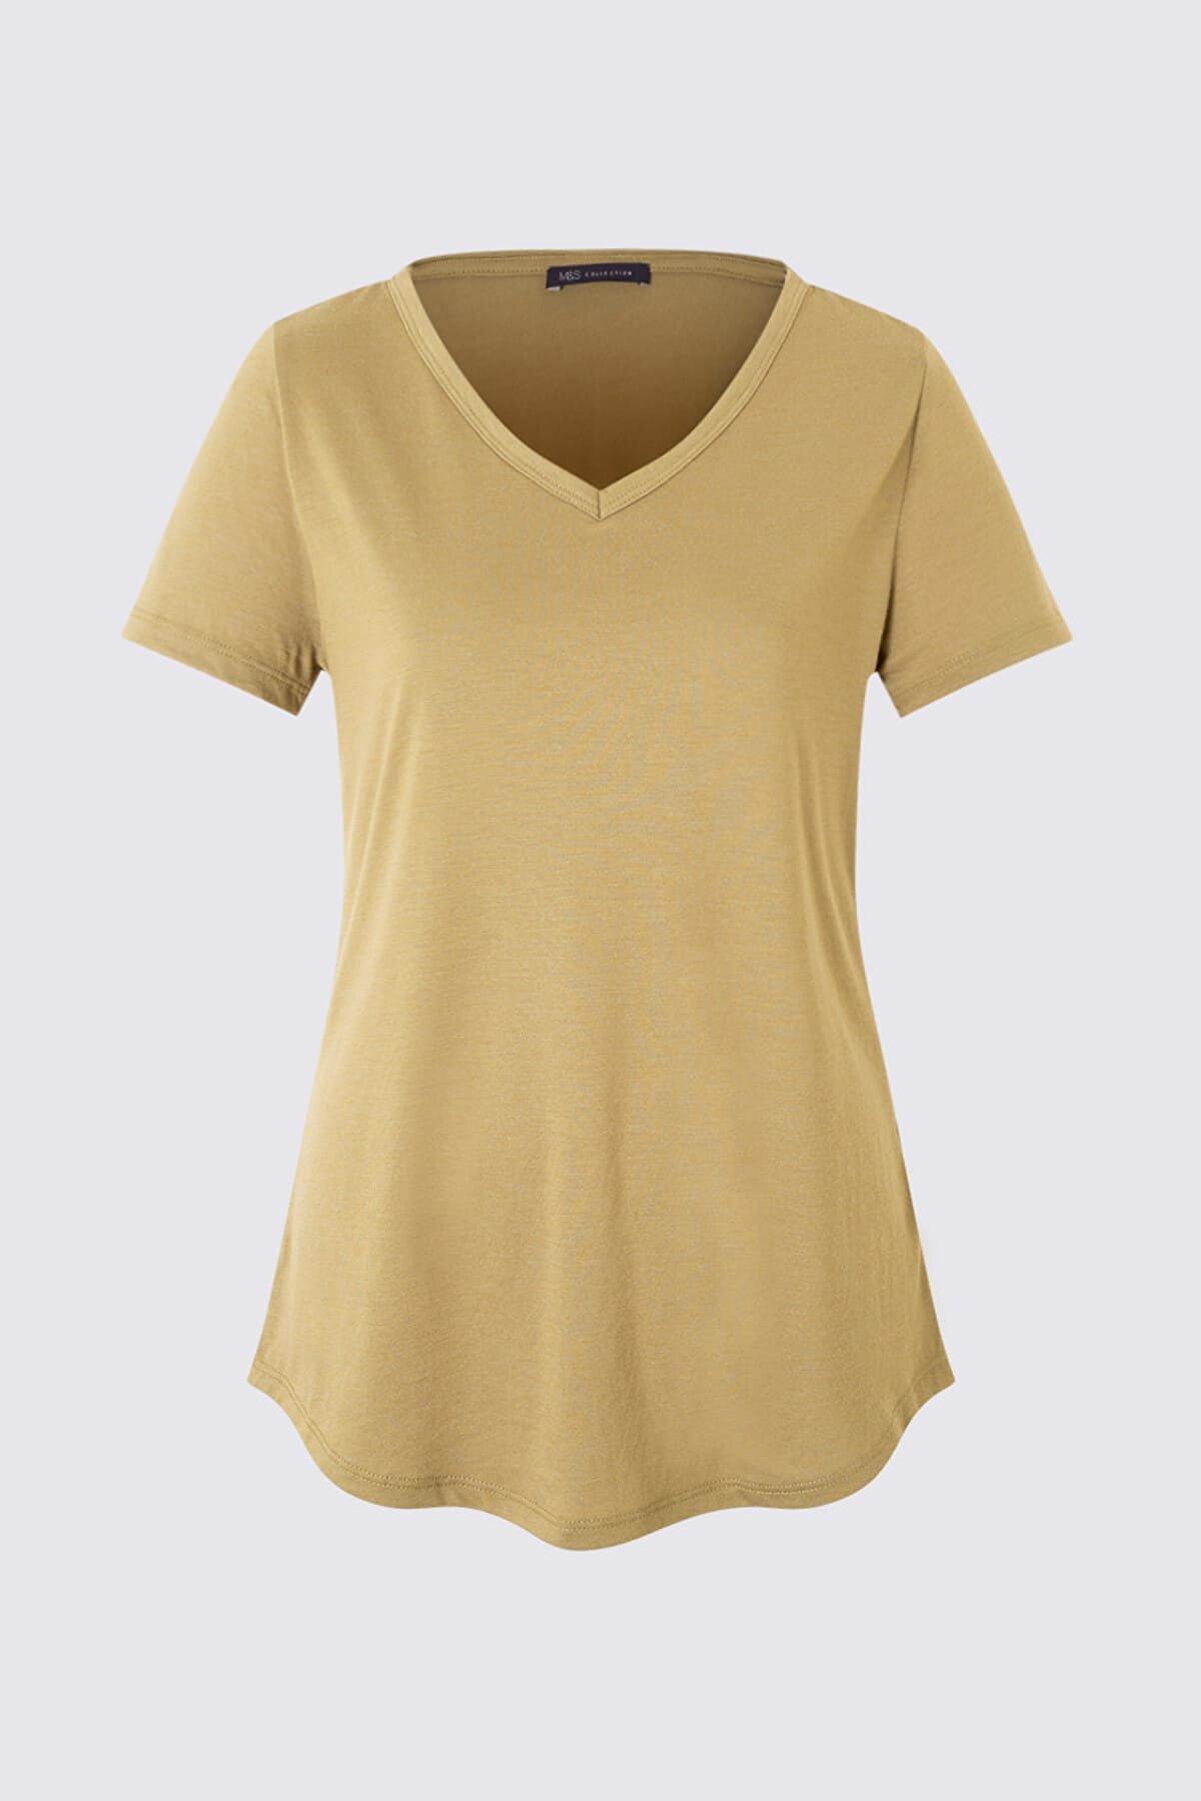 Marks & Spencer Kadın Yeşil Kısa Kollu V Yaka T-shirt T41001270H